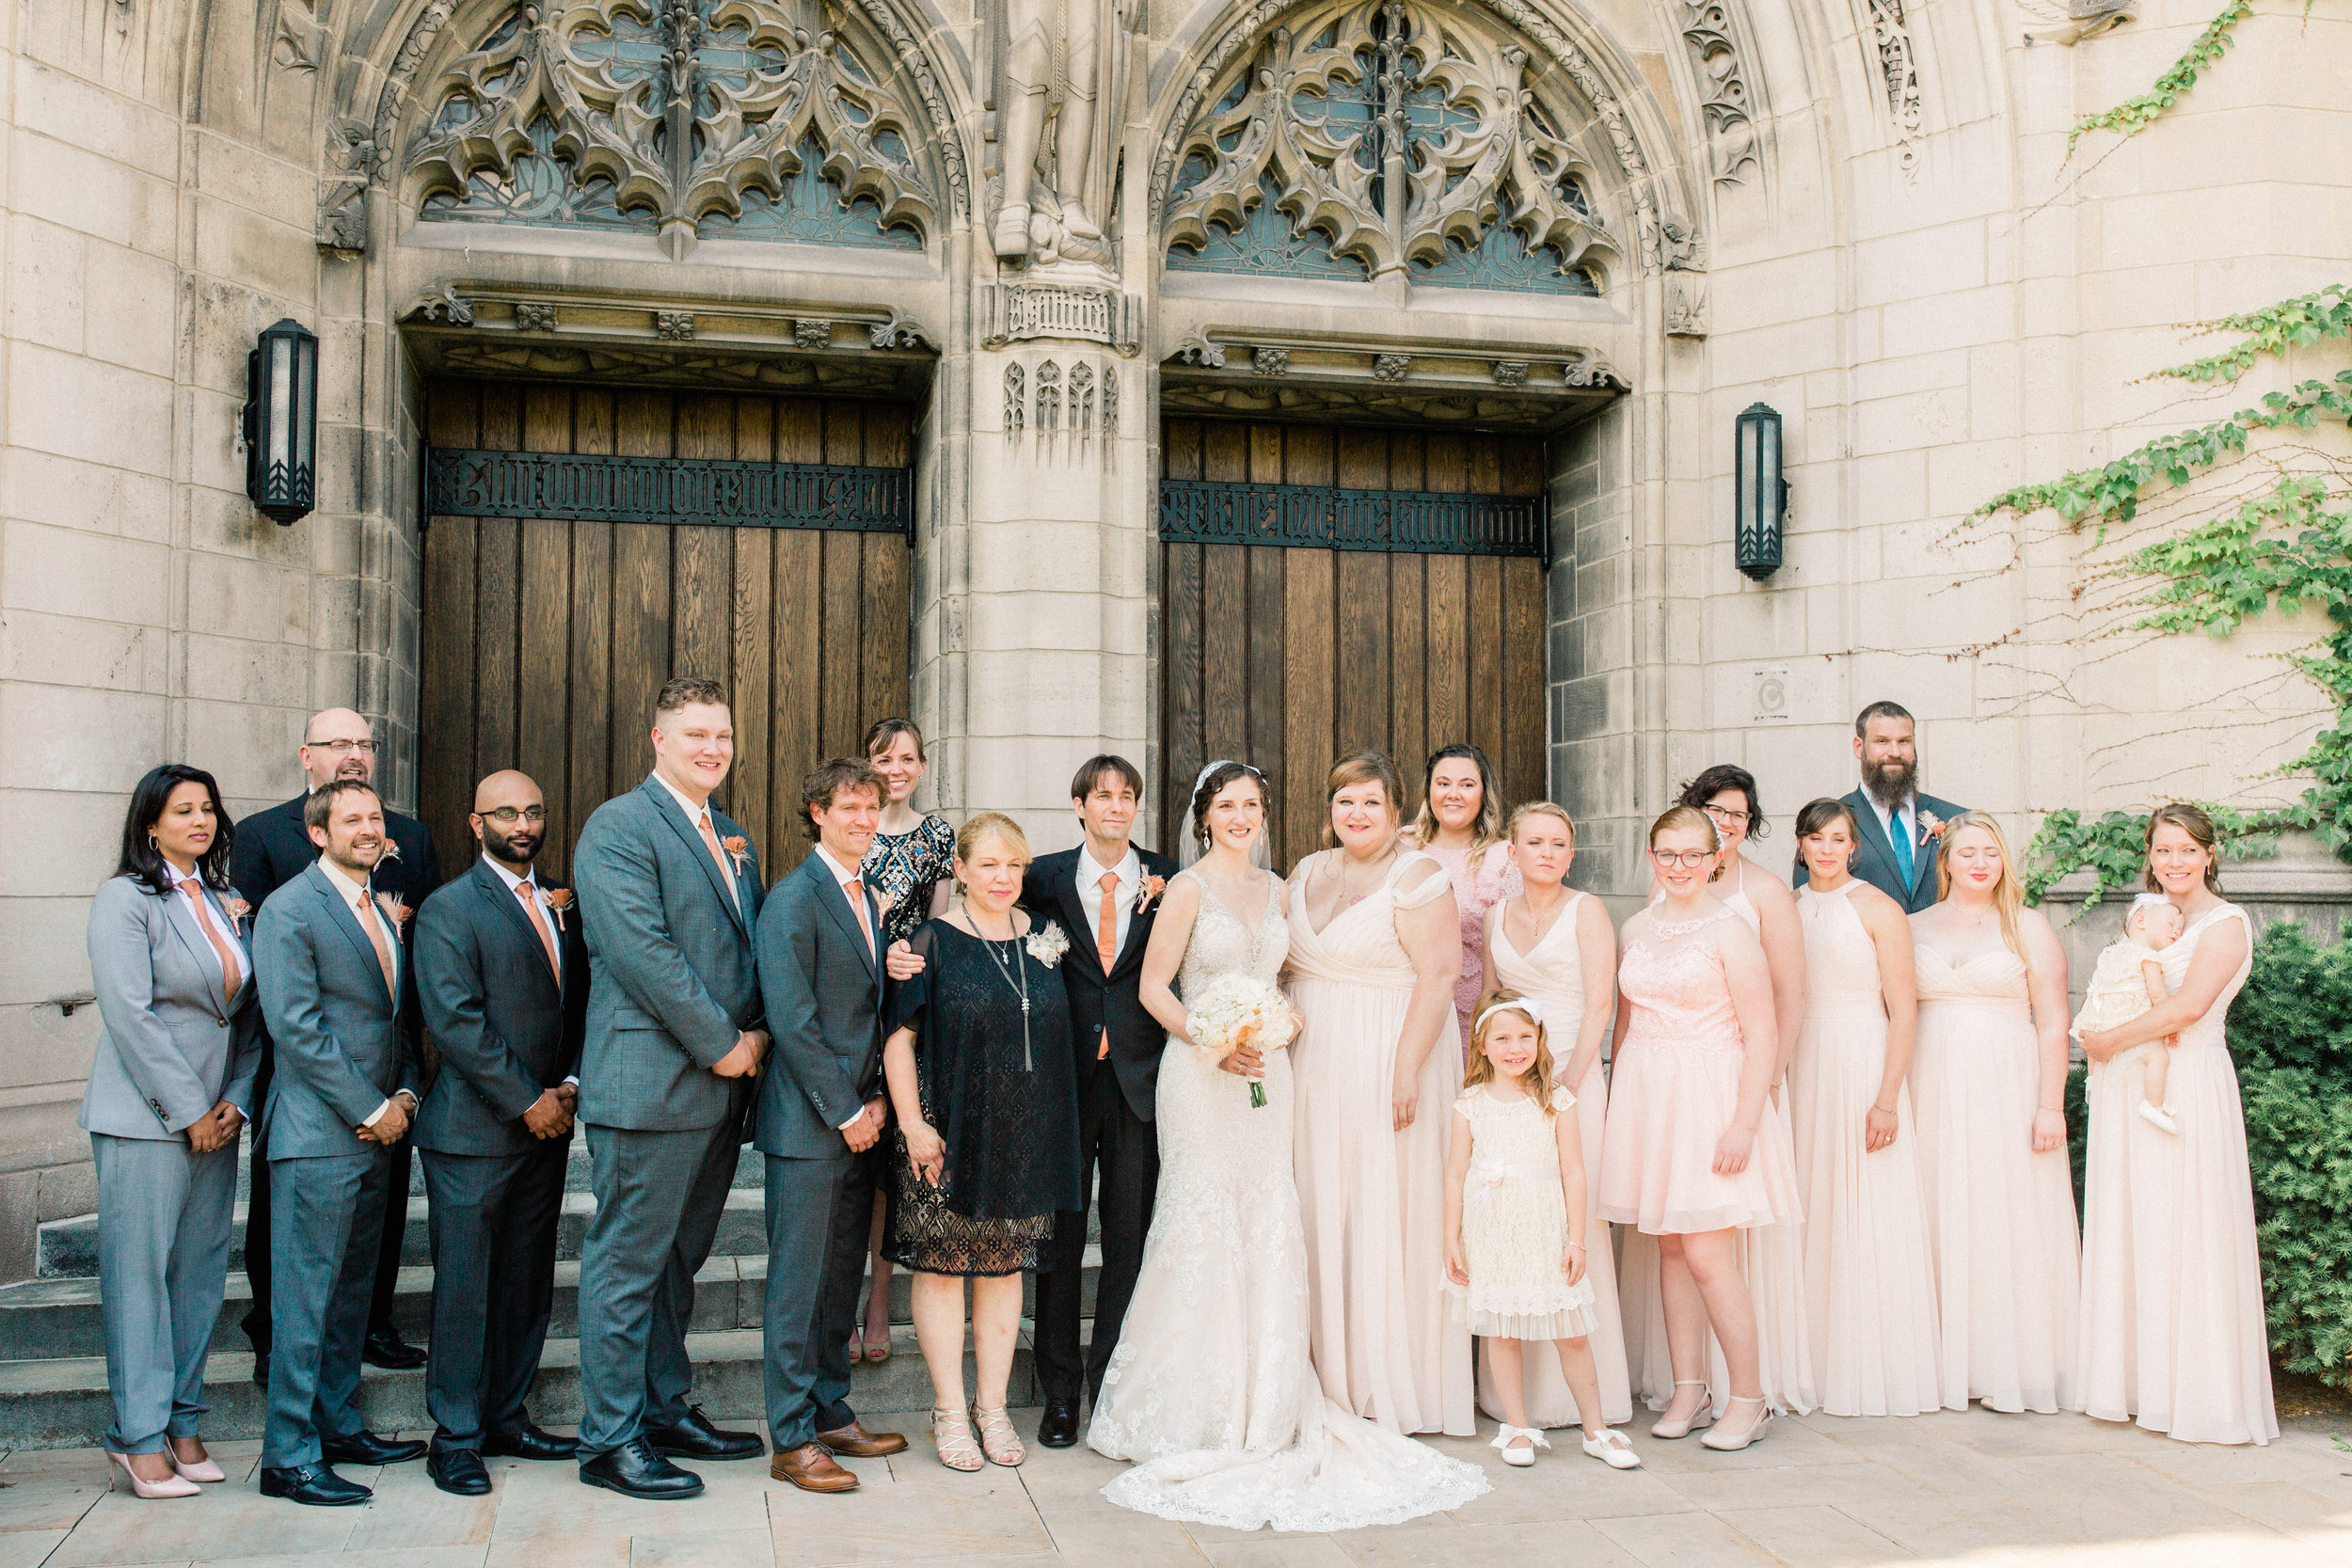 Dorothy_Louise_Photography_University_of_Chicago_Chapel_Wedding-42.jpg